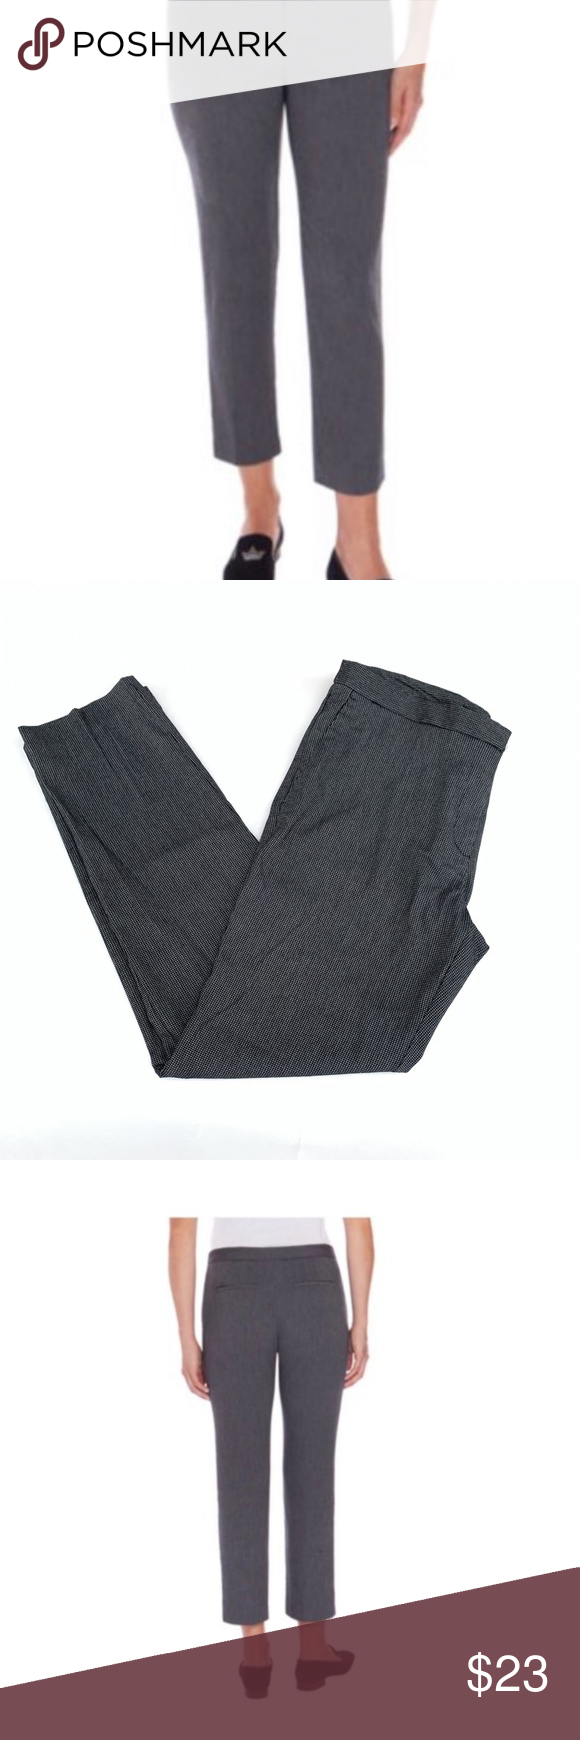 Mario Serrani Ladies/' Comfort Stretch Slim Fit Pants NWT